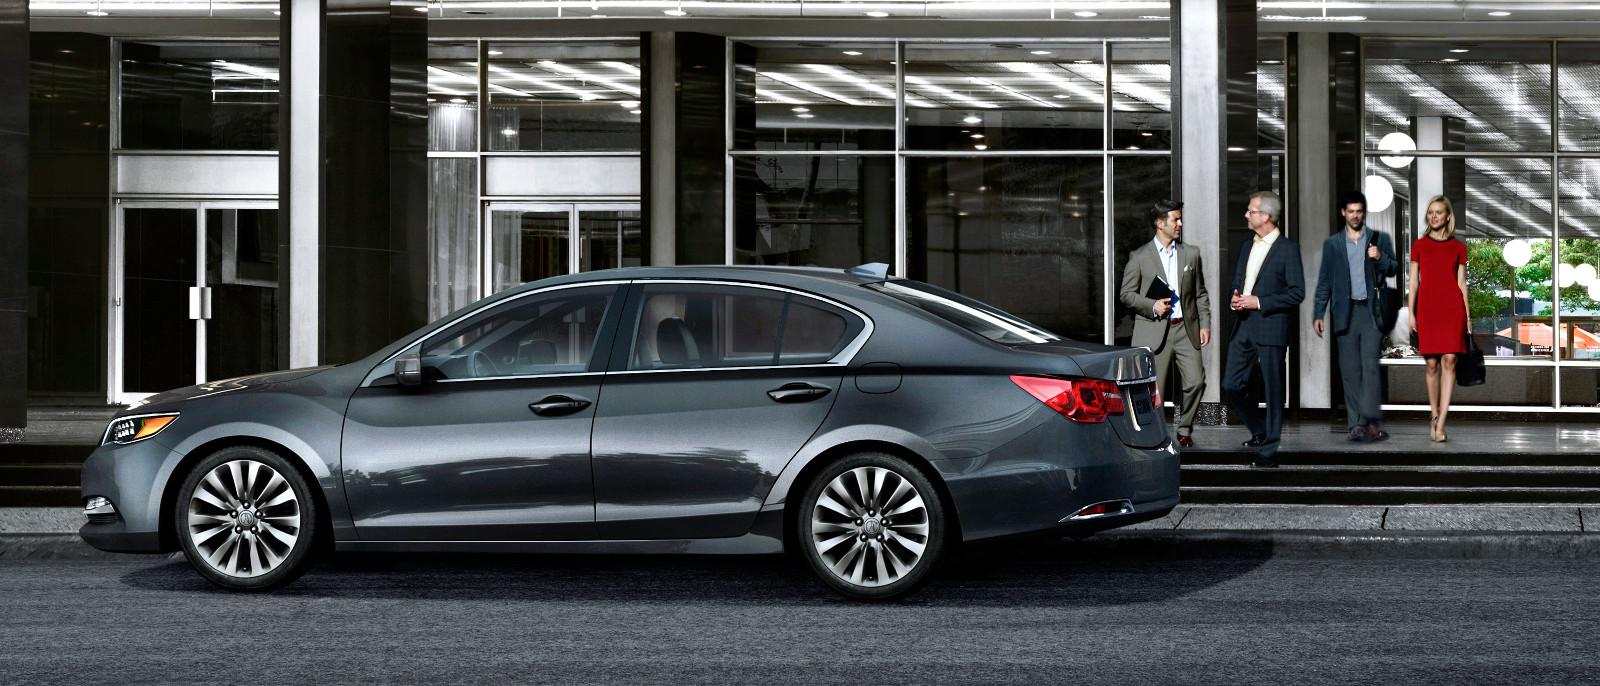 2016 Acura Rlx Model Overview Mcgrath Acura Of Westmont